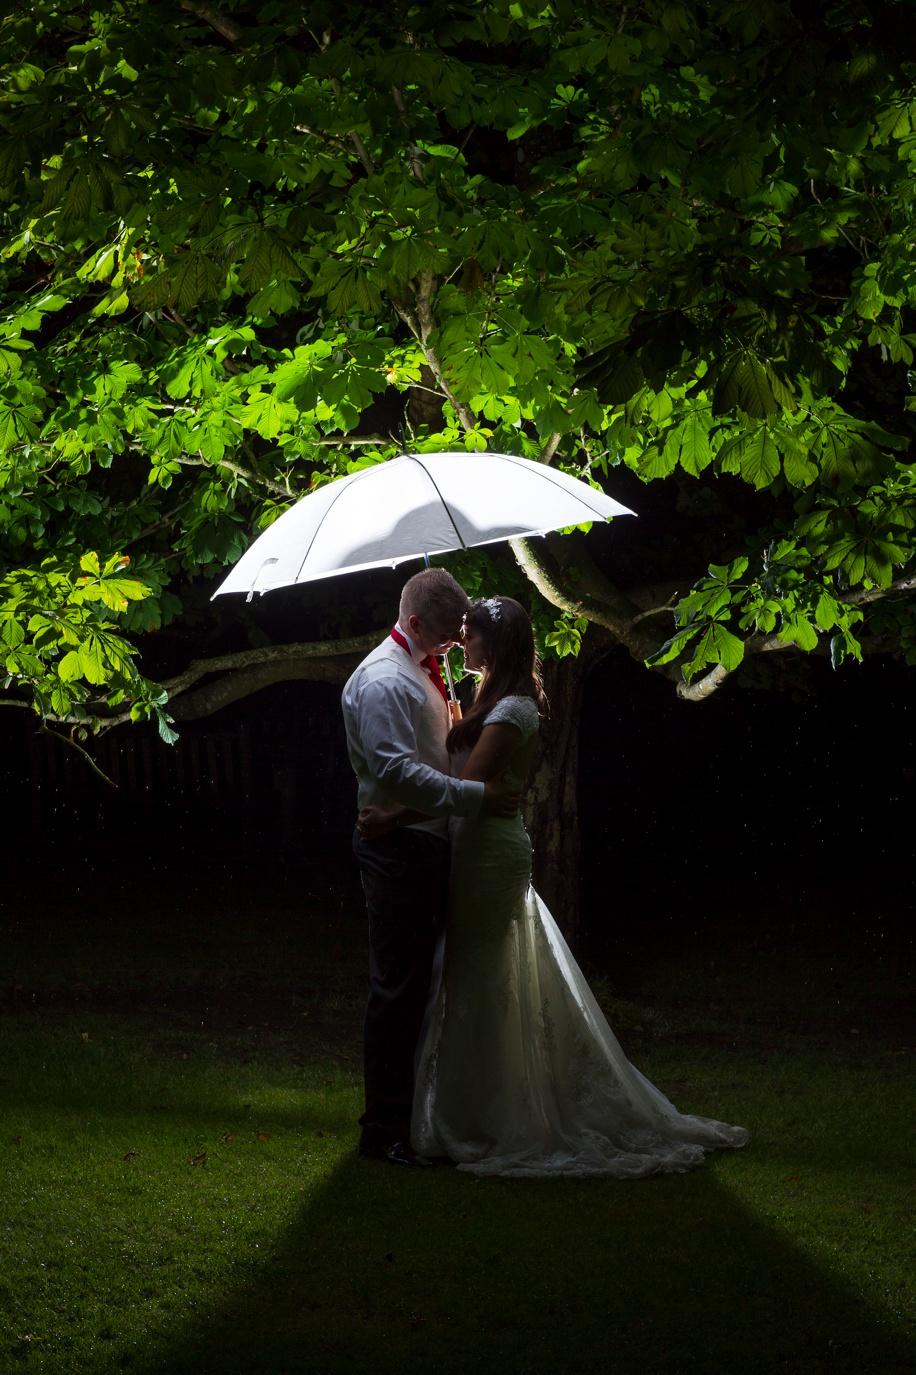 Amazing wedding photograph ideas in the rain - Manor barn Buriton